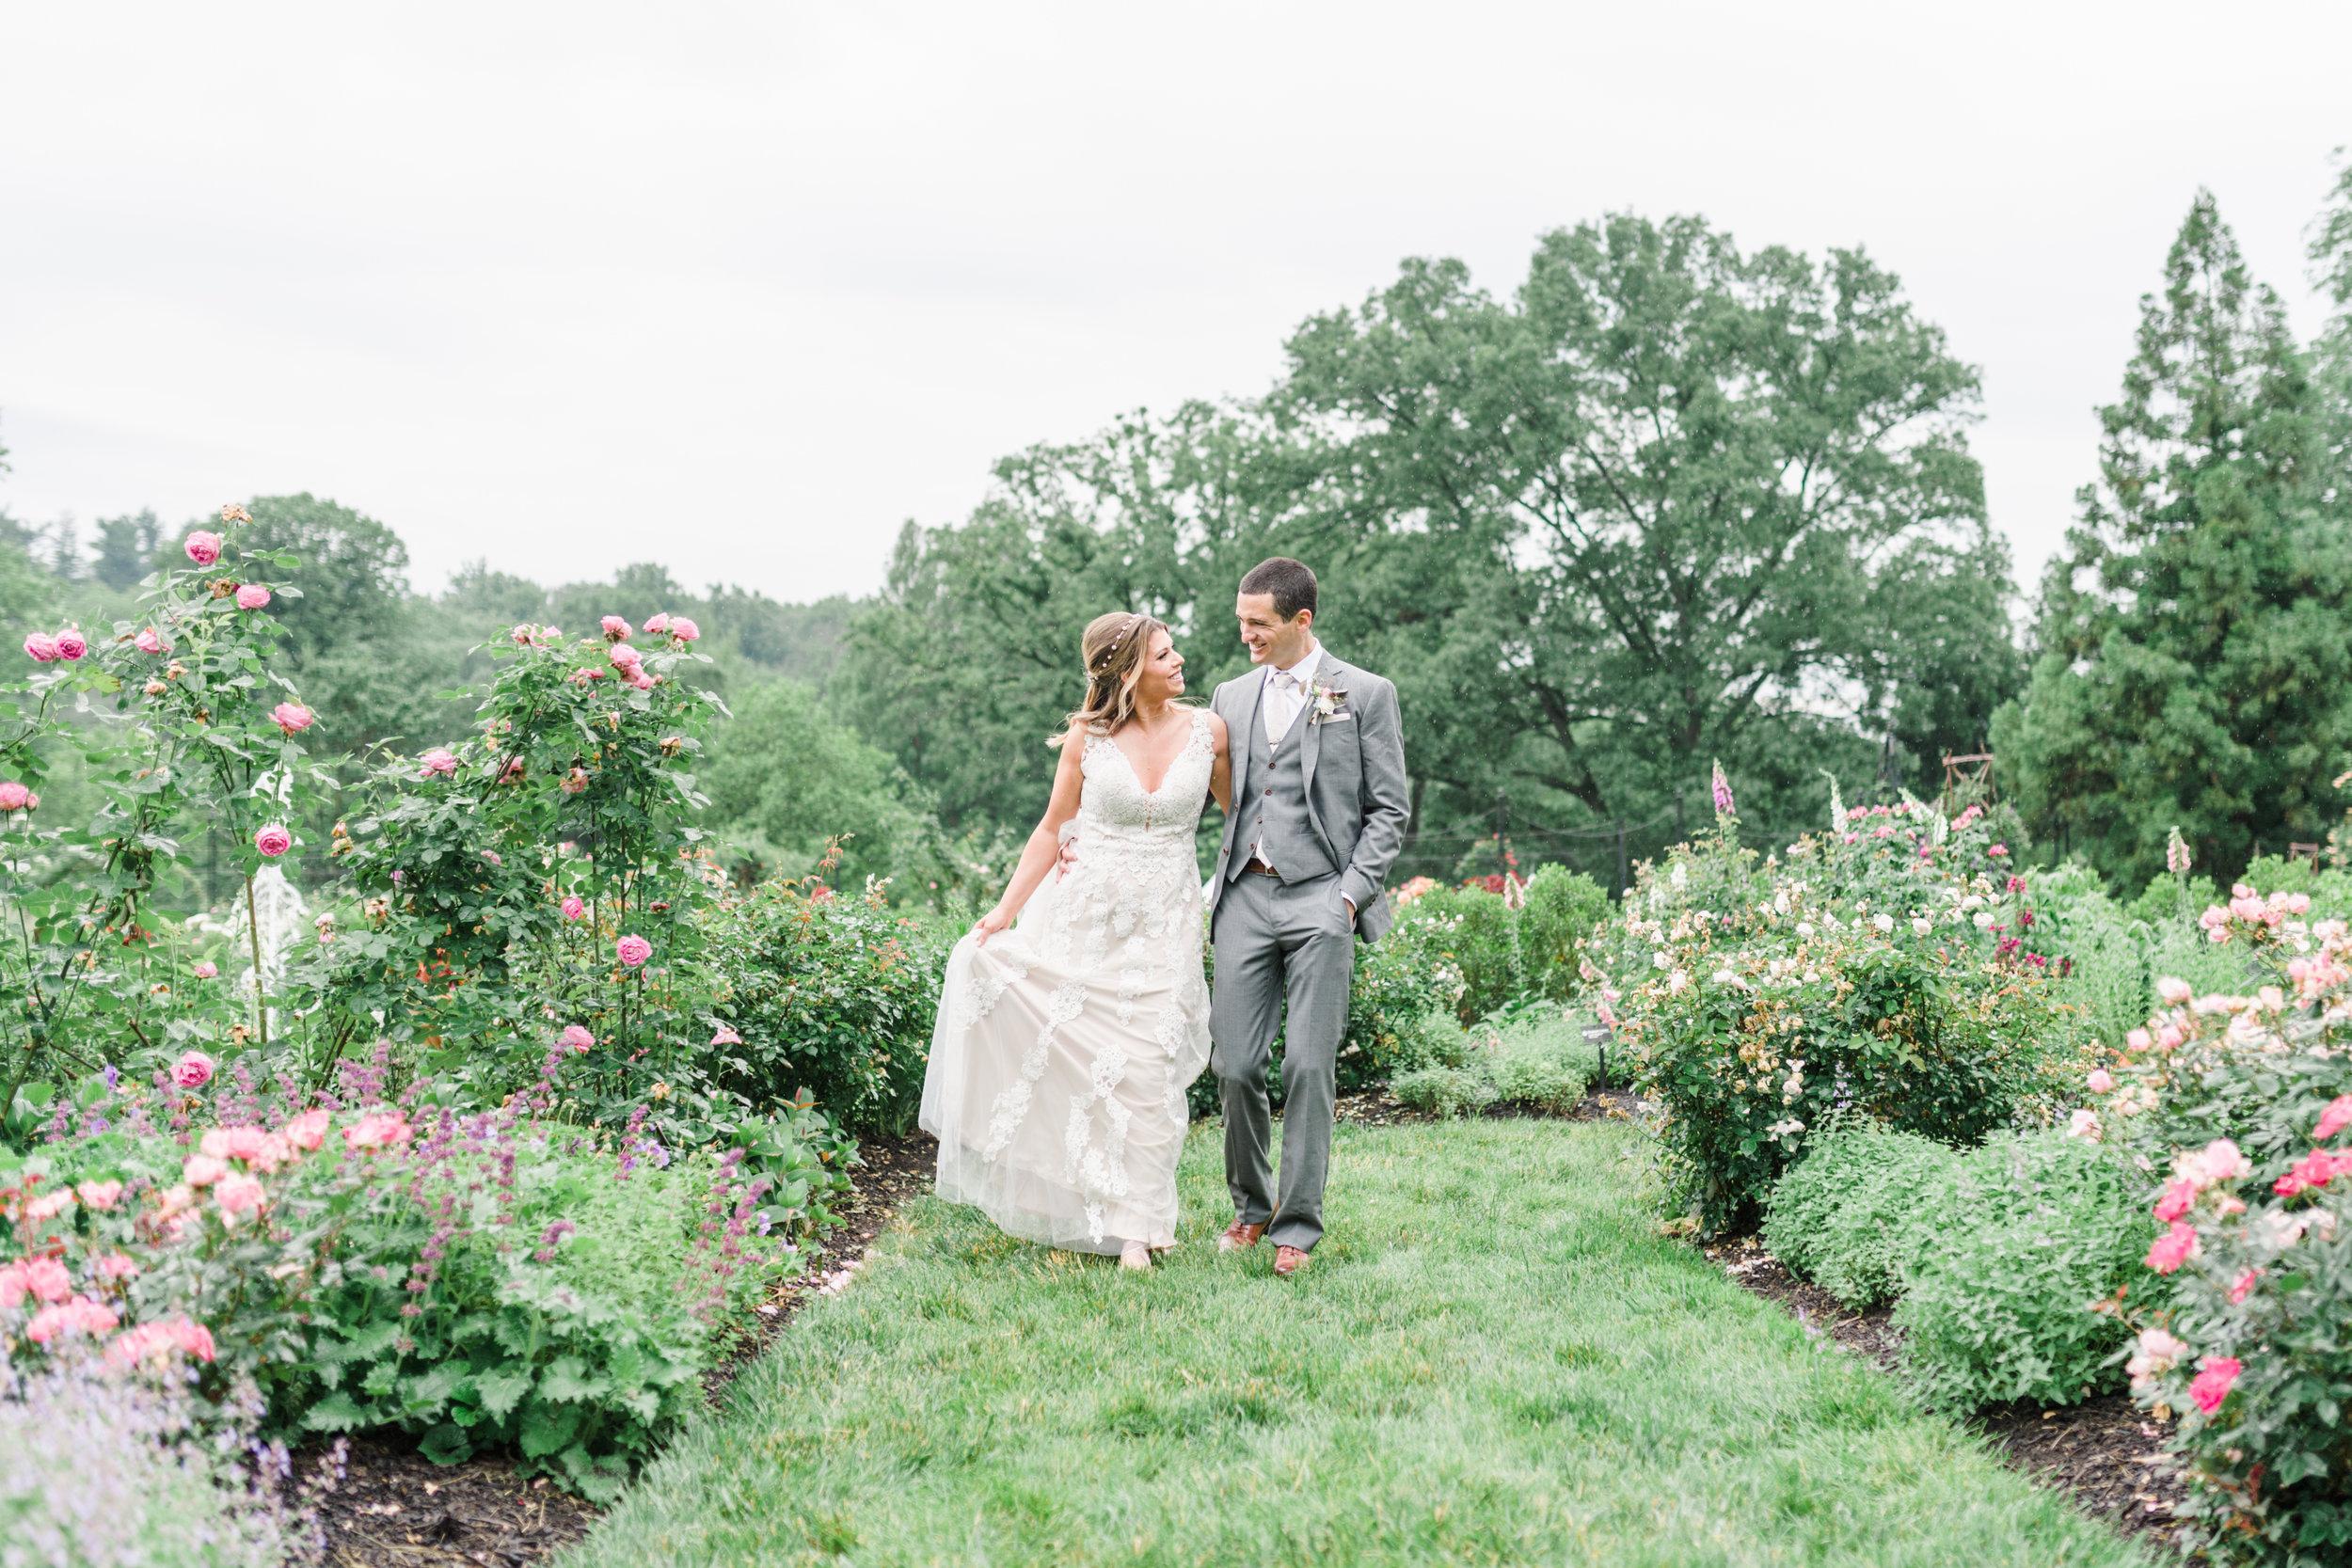 Heather + Will | Morris Arboretum of the University of Pennsylvania | Phila, PA